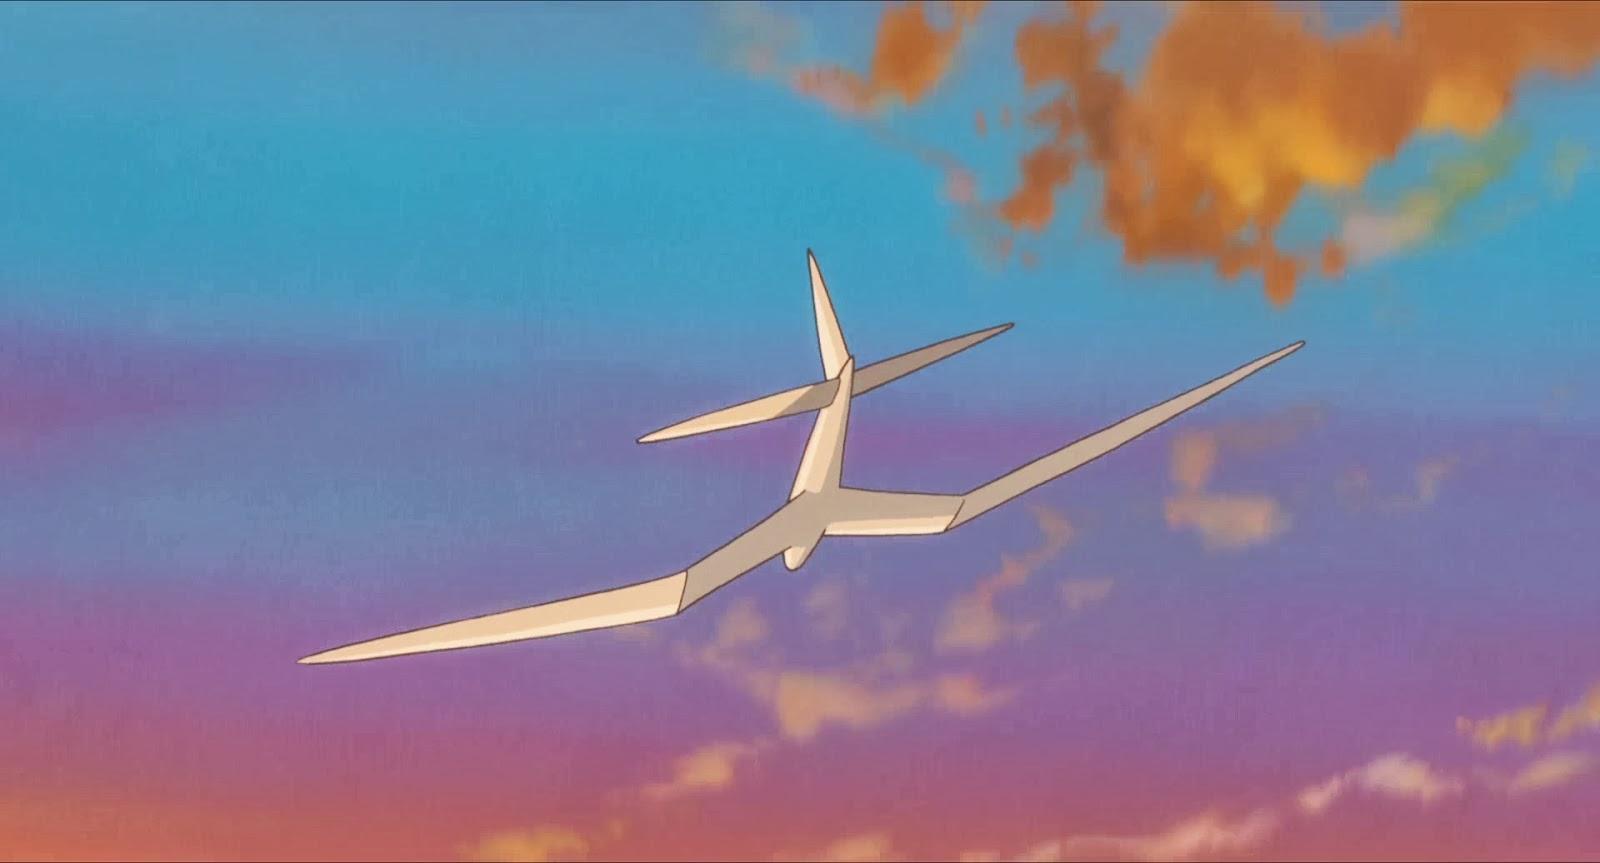 Blu Ray Review The Wind Rises 2013 Dir Hayao Miyazaki